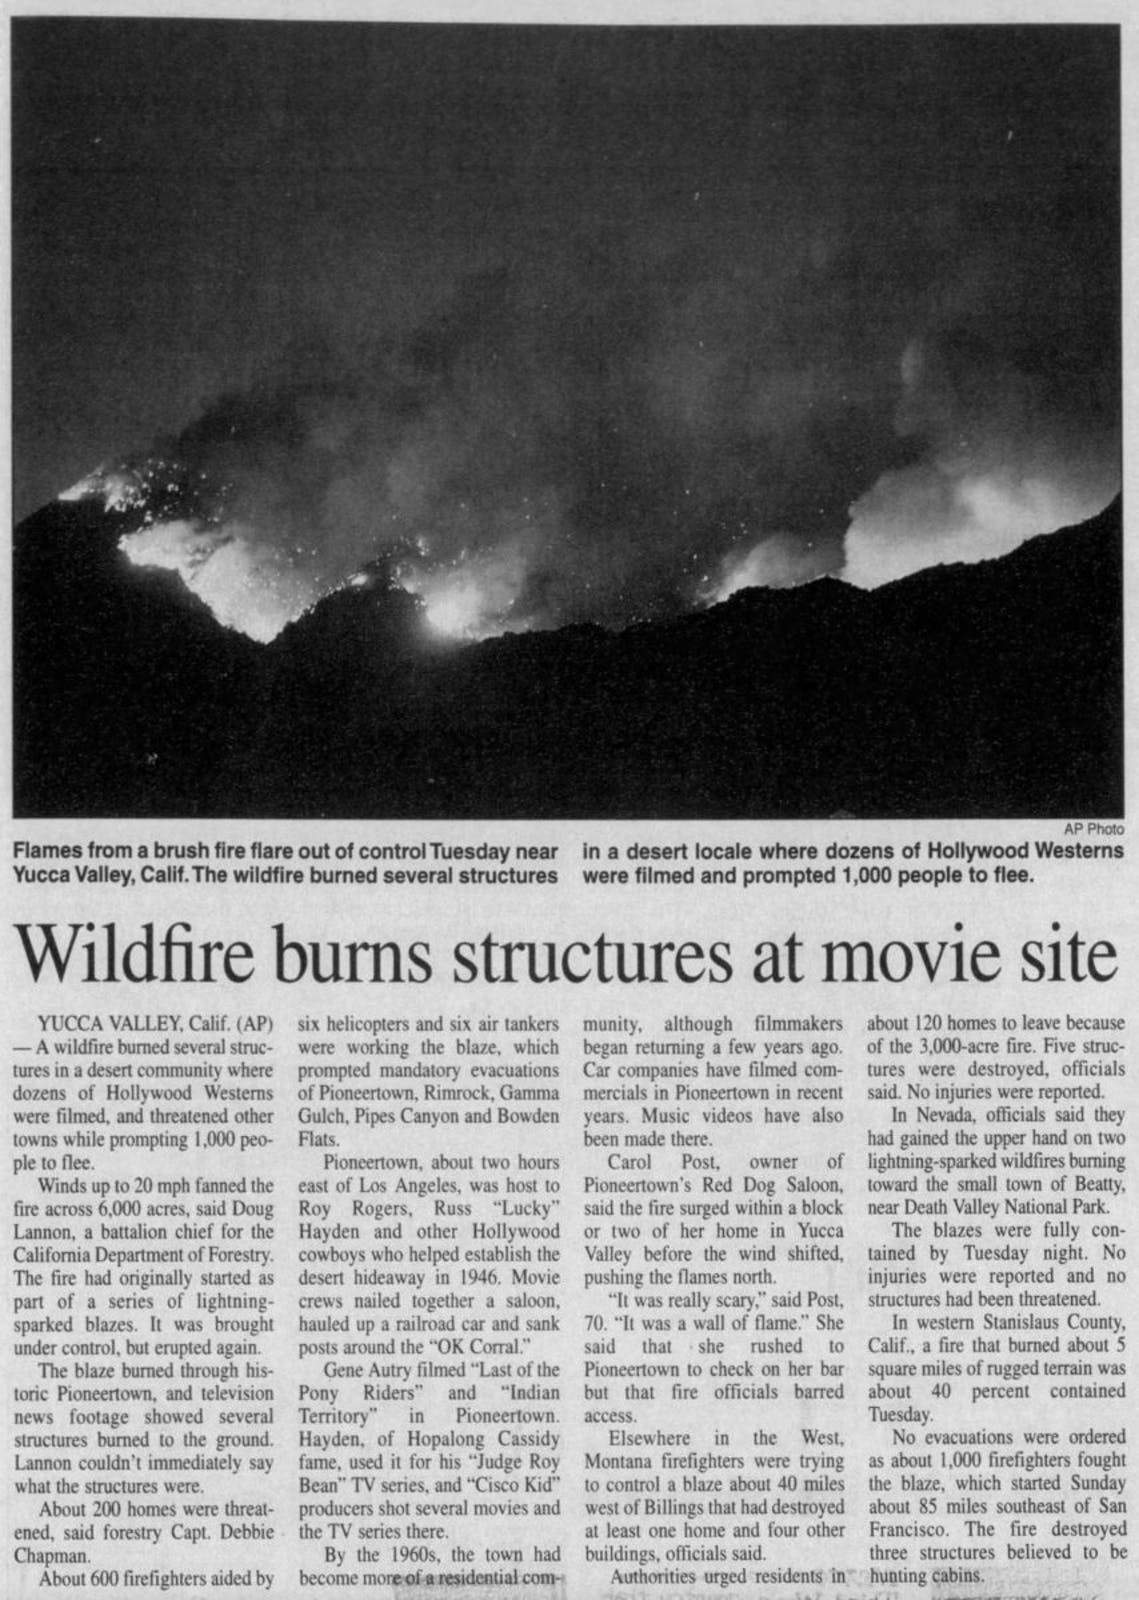 wildfire burn movie set clipping